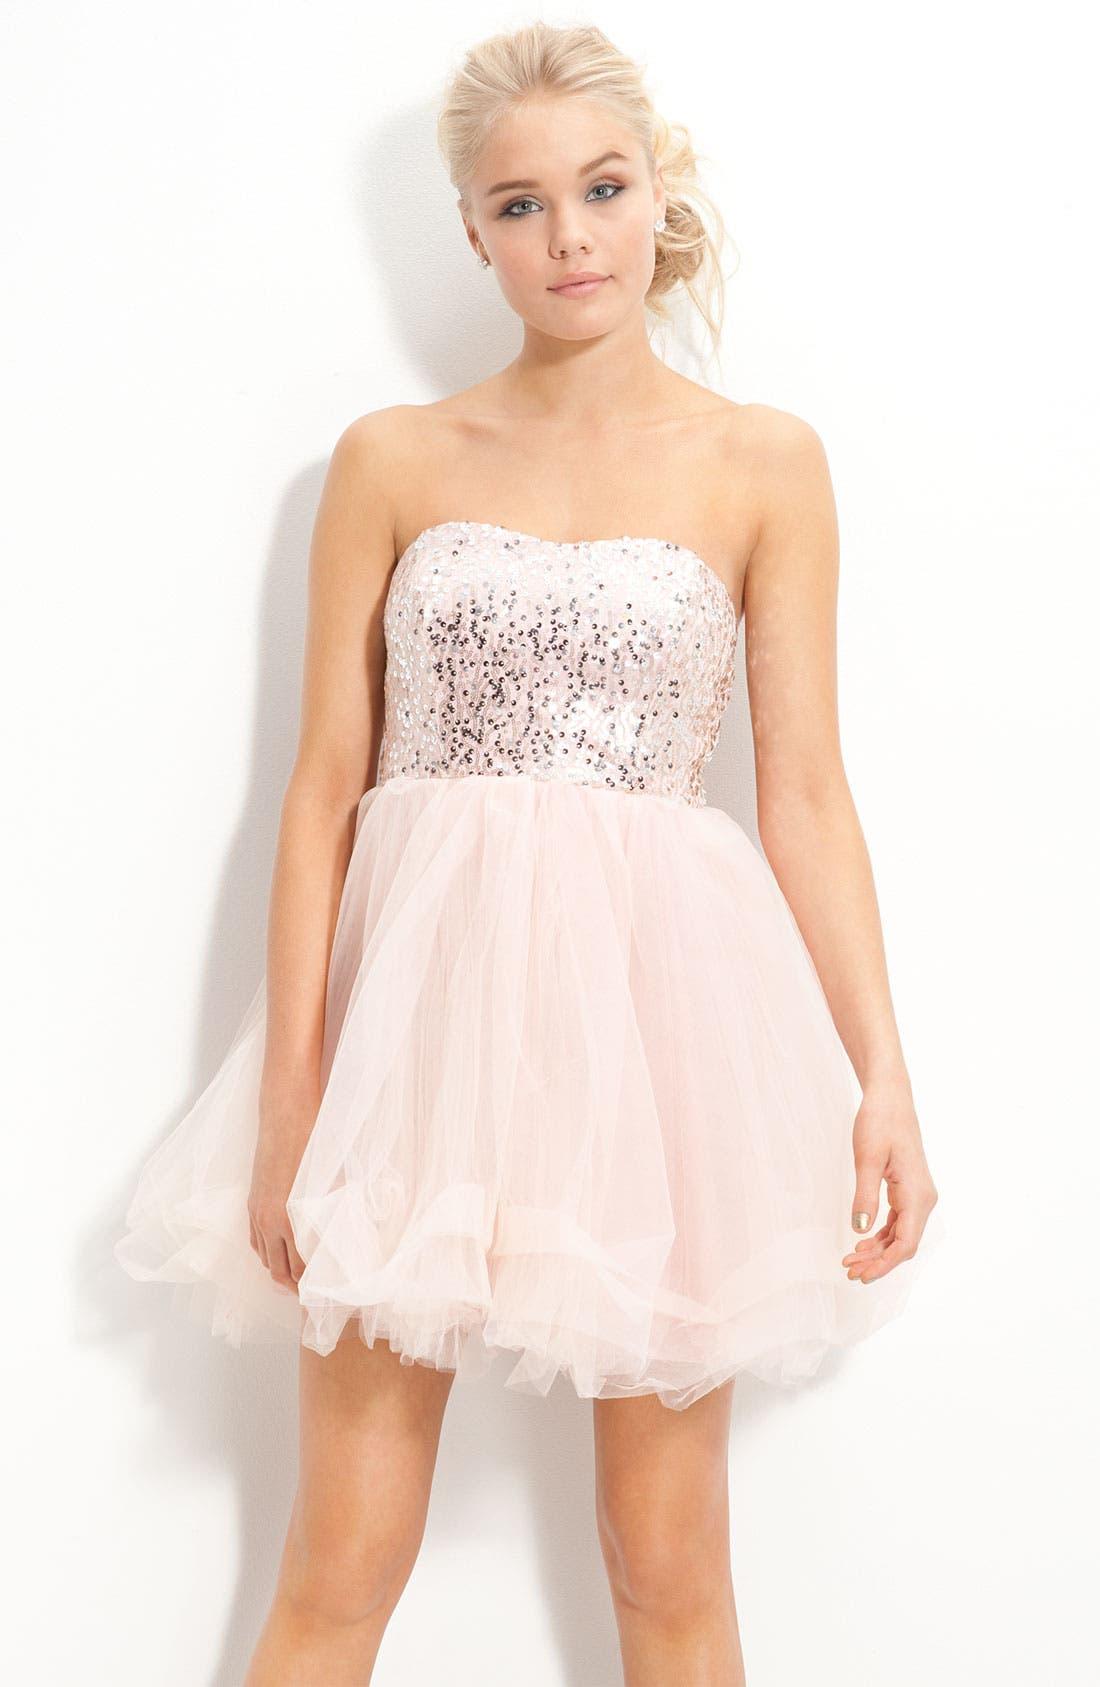 Alternate Image 1 Selected - Trixxi 'Ballerina' Dress (Juniors)